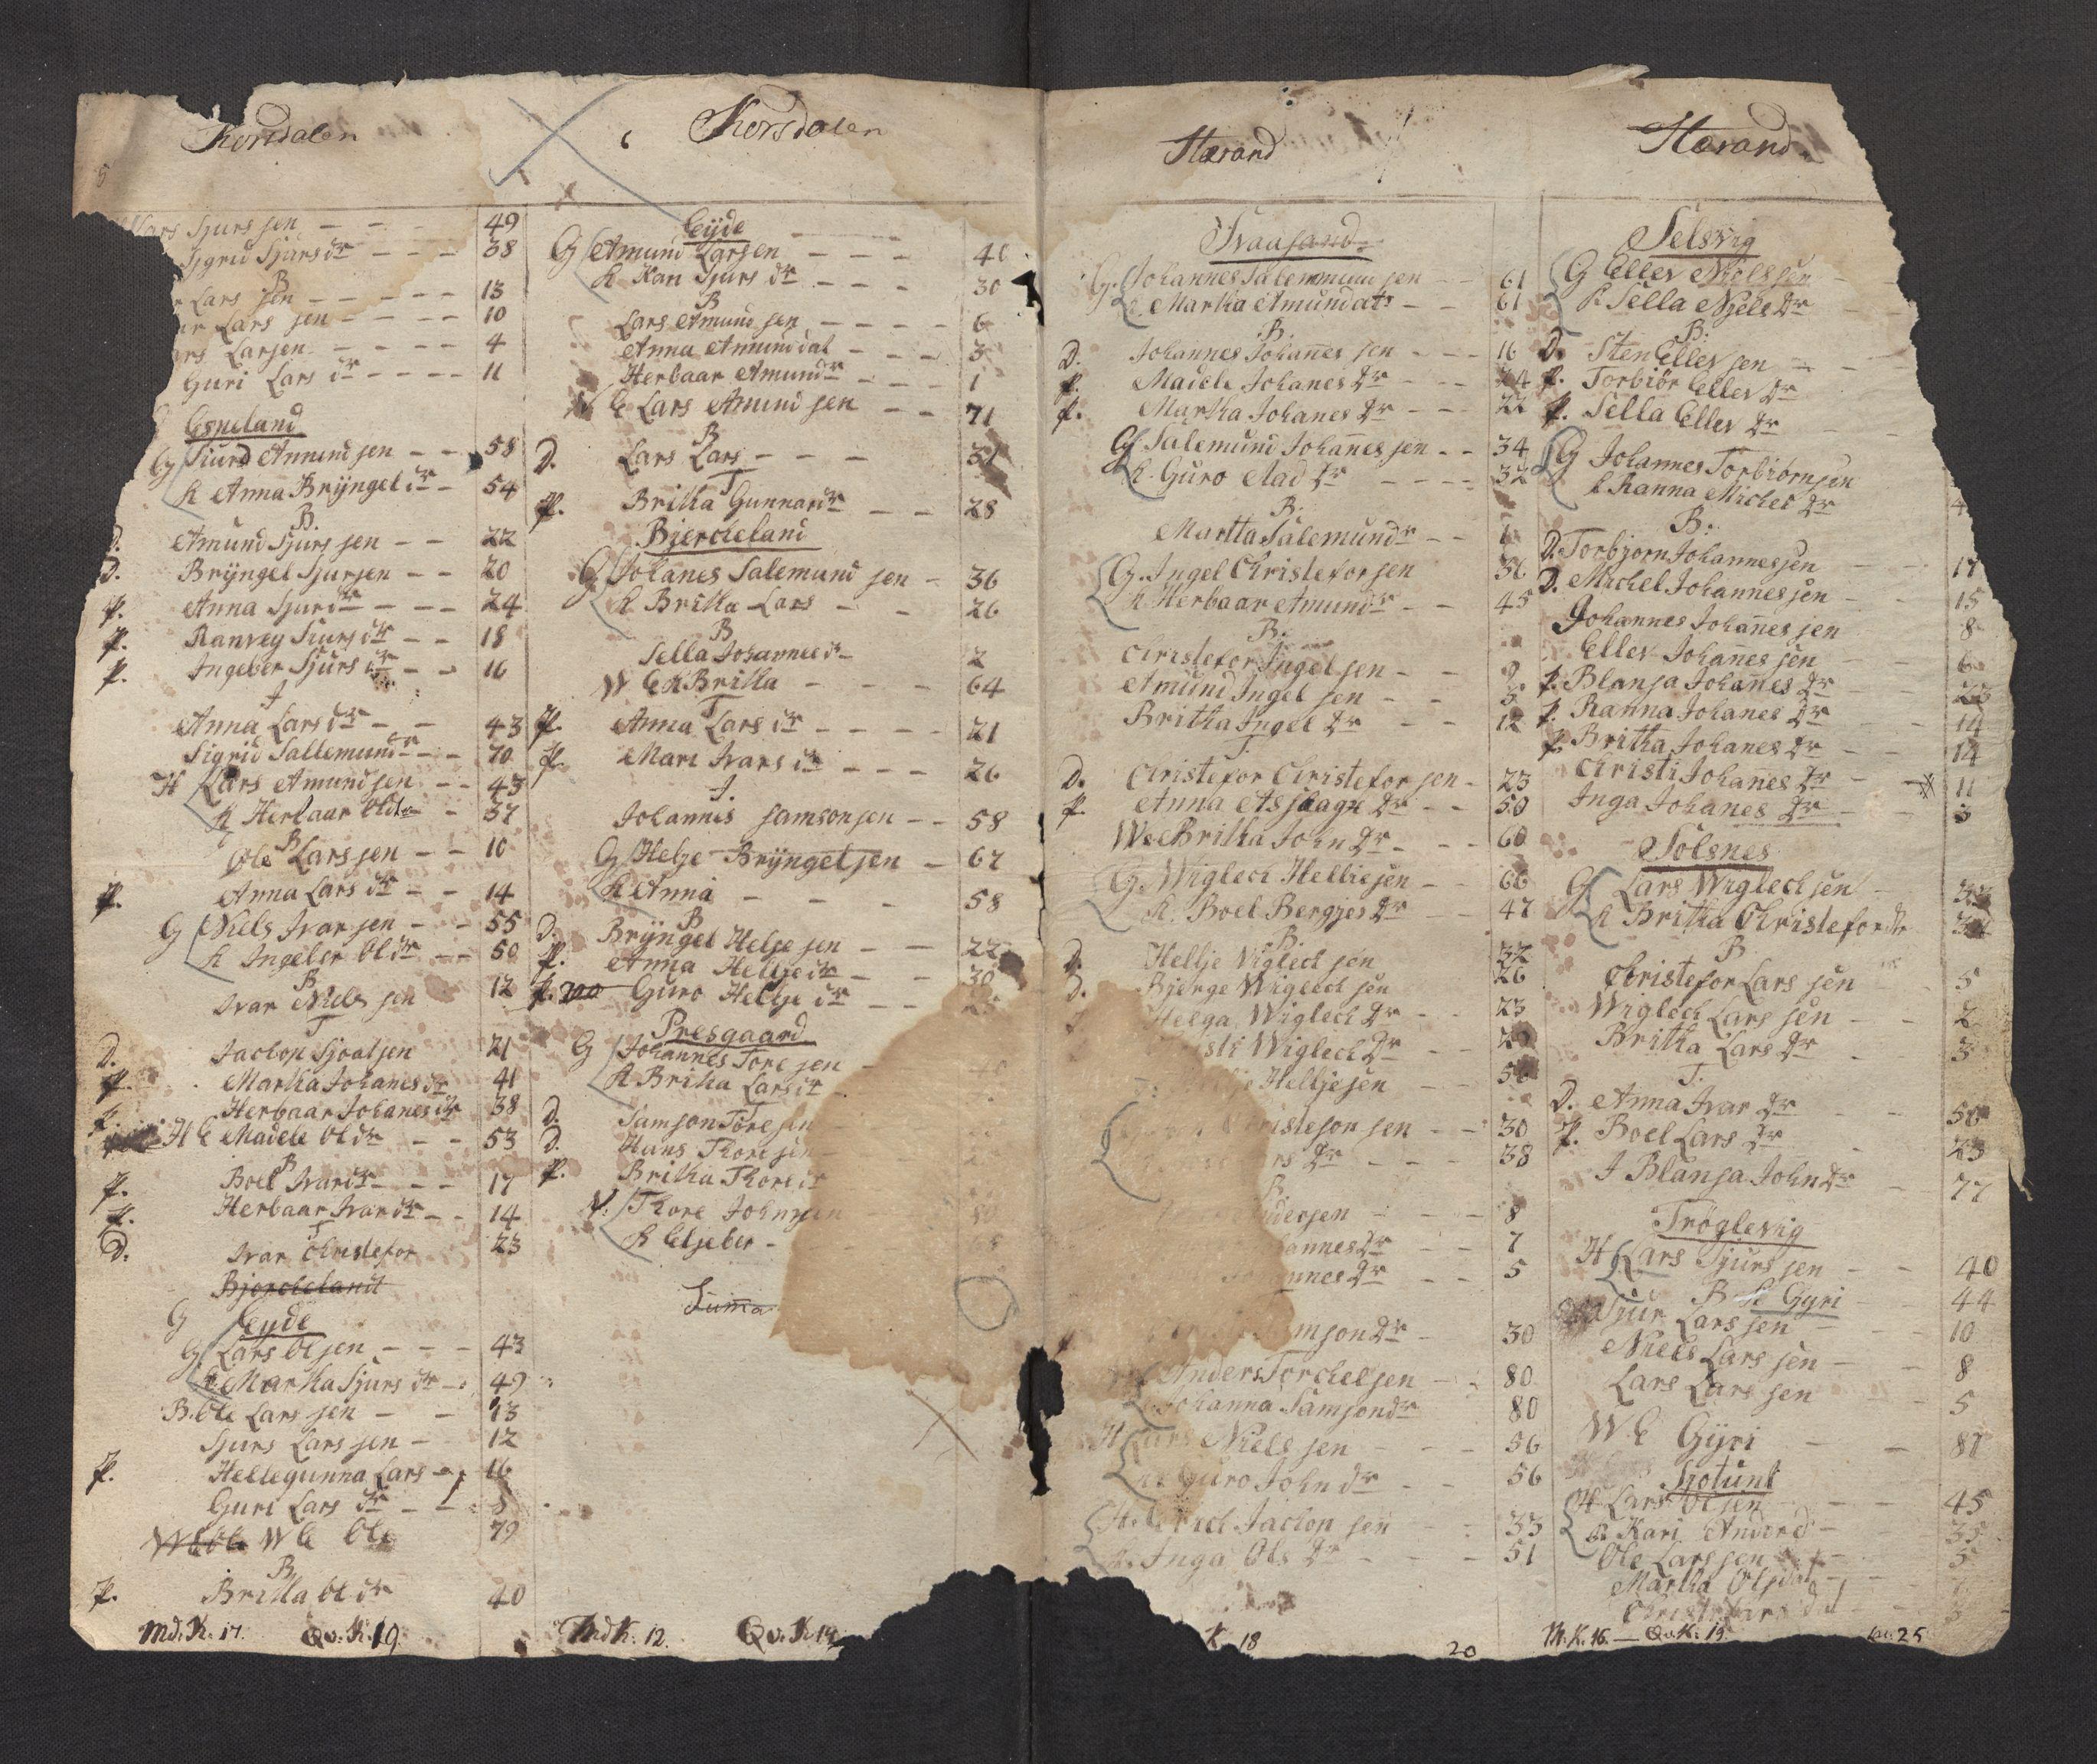 SAB, Folketelling 1815 for 1226P Strandebarm prestegjeld, 1815, s. 7